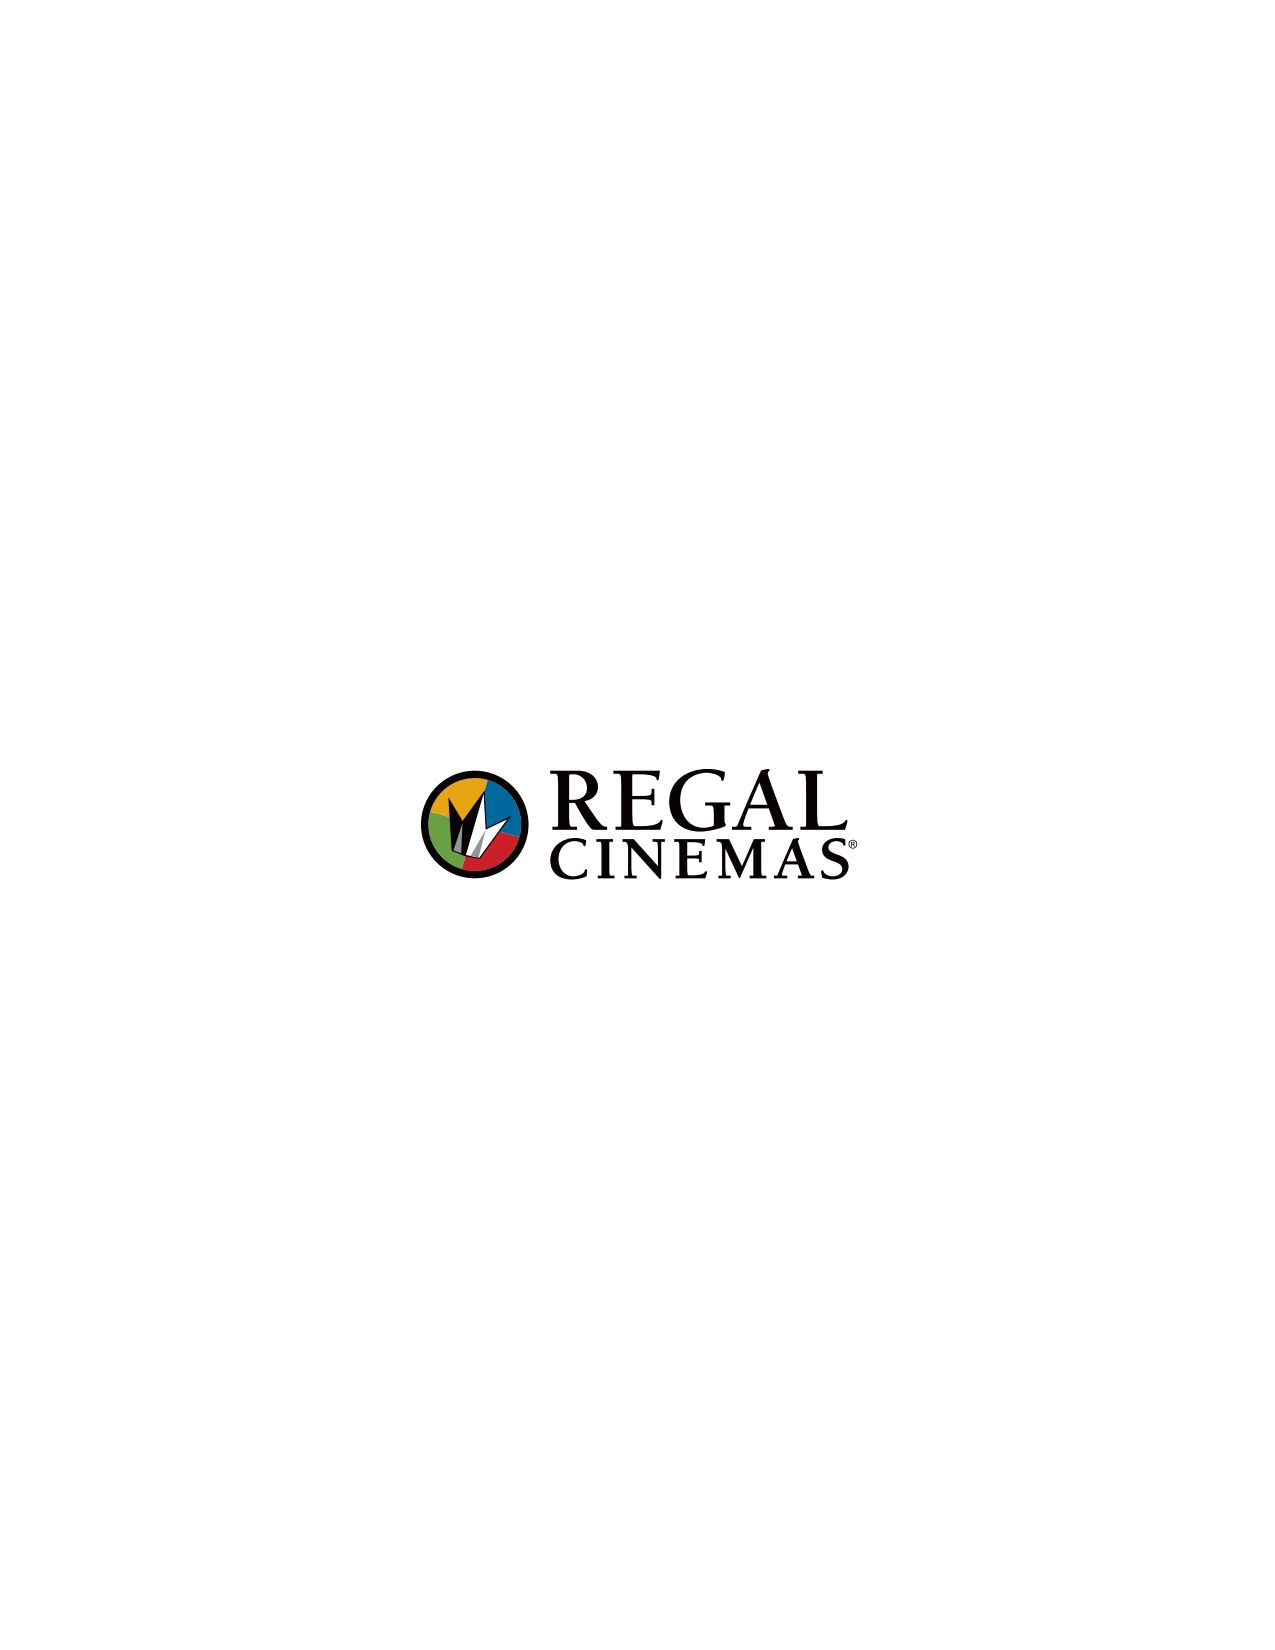 logos amp trademark usage policy regal entertainment group